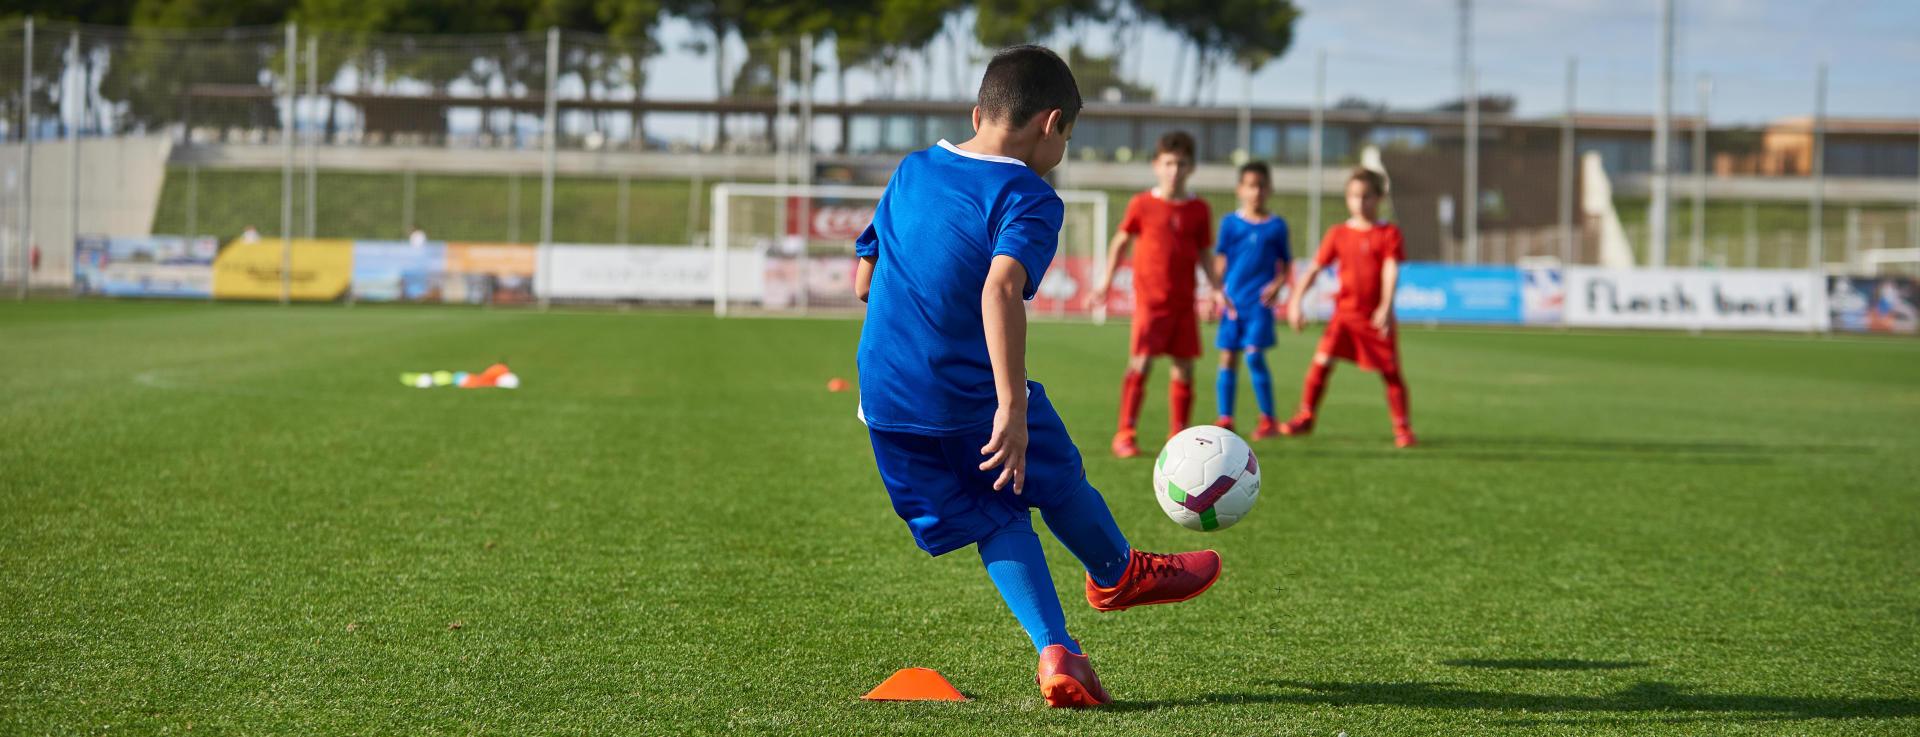 Accompagner-son-enfant-au-football